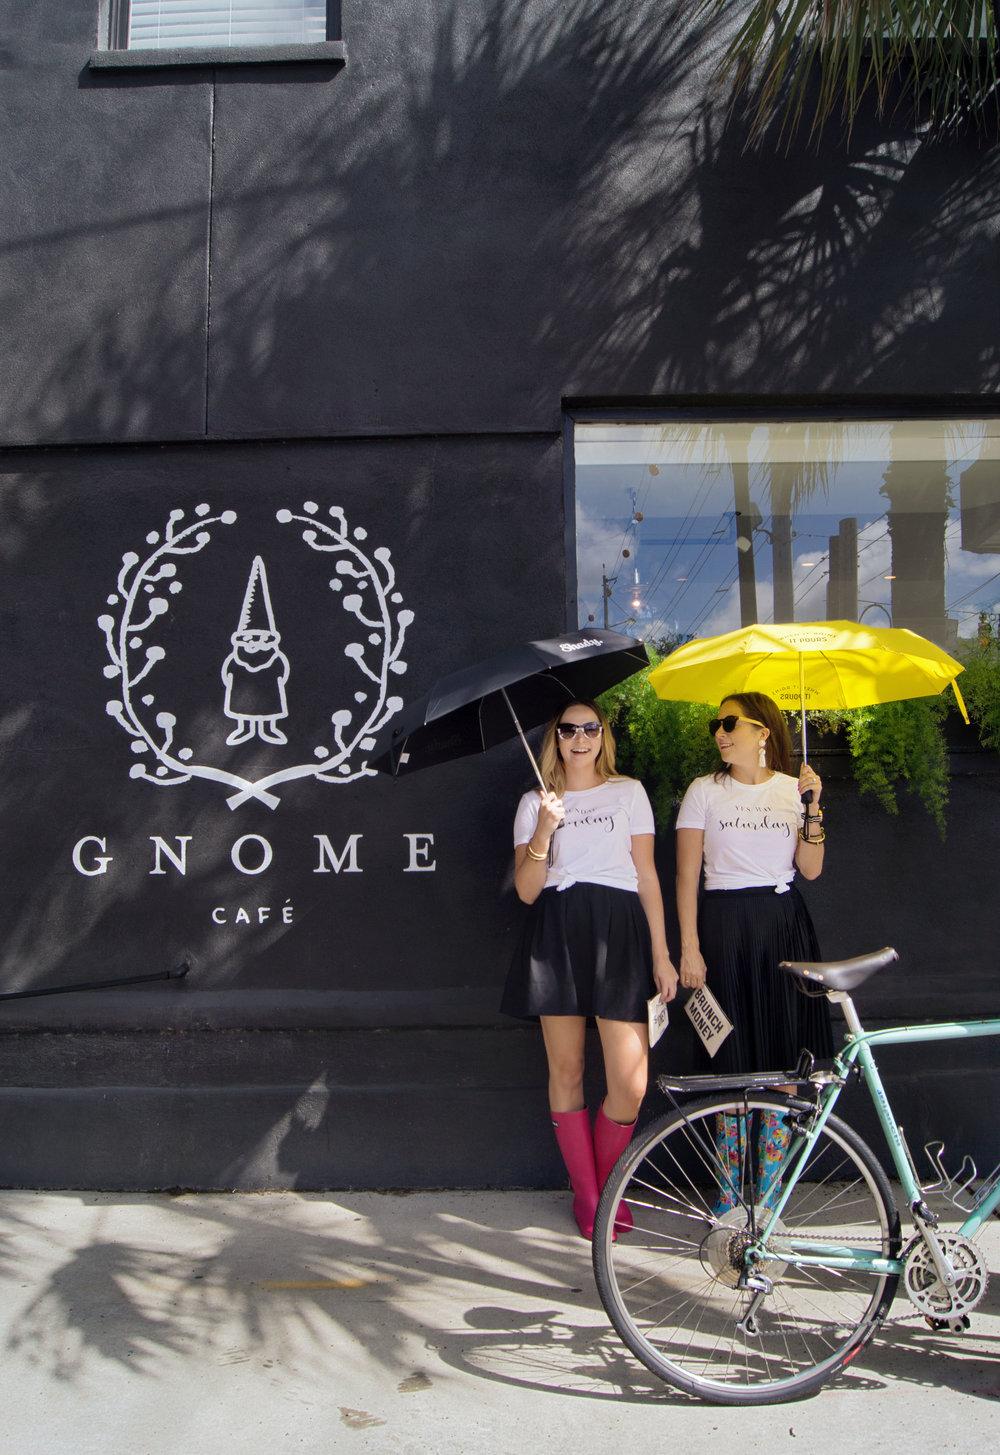 Rainy Day Charleston activities Gnome Cafe